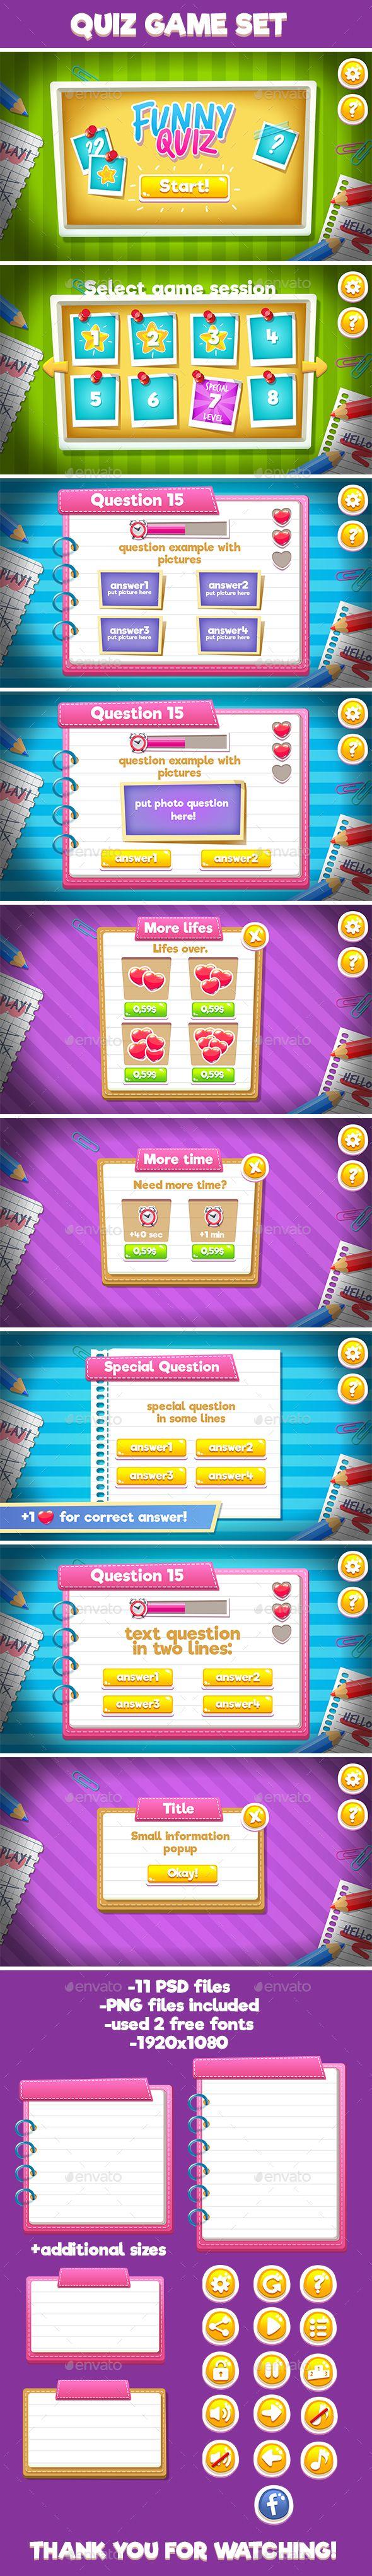 Quiz Full Game Set (User Interfaces)